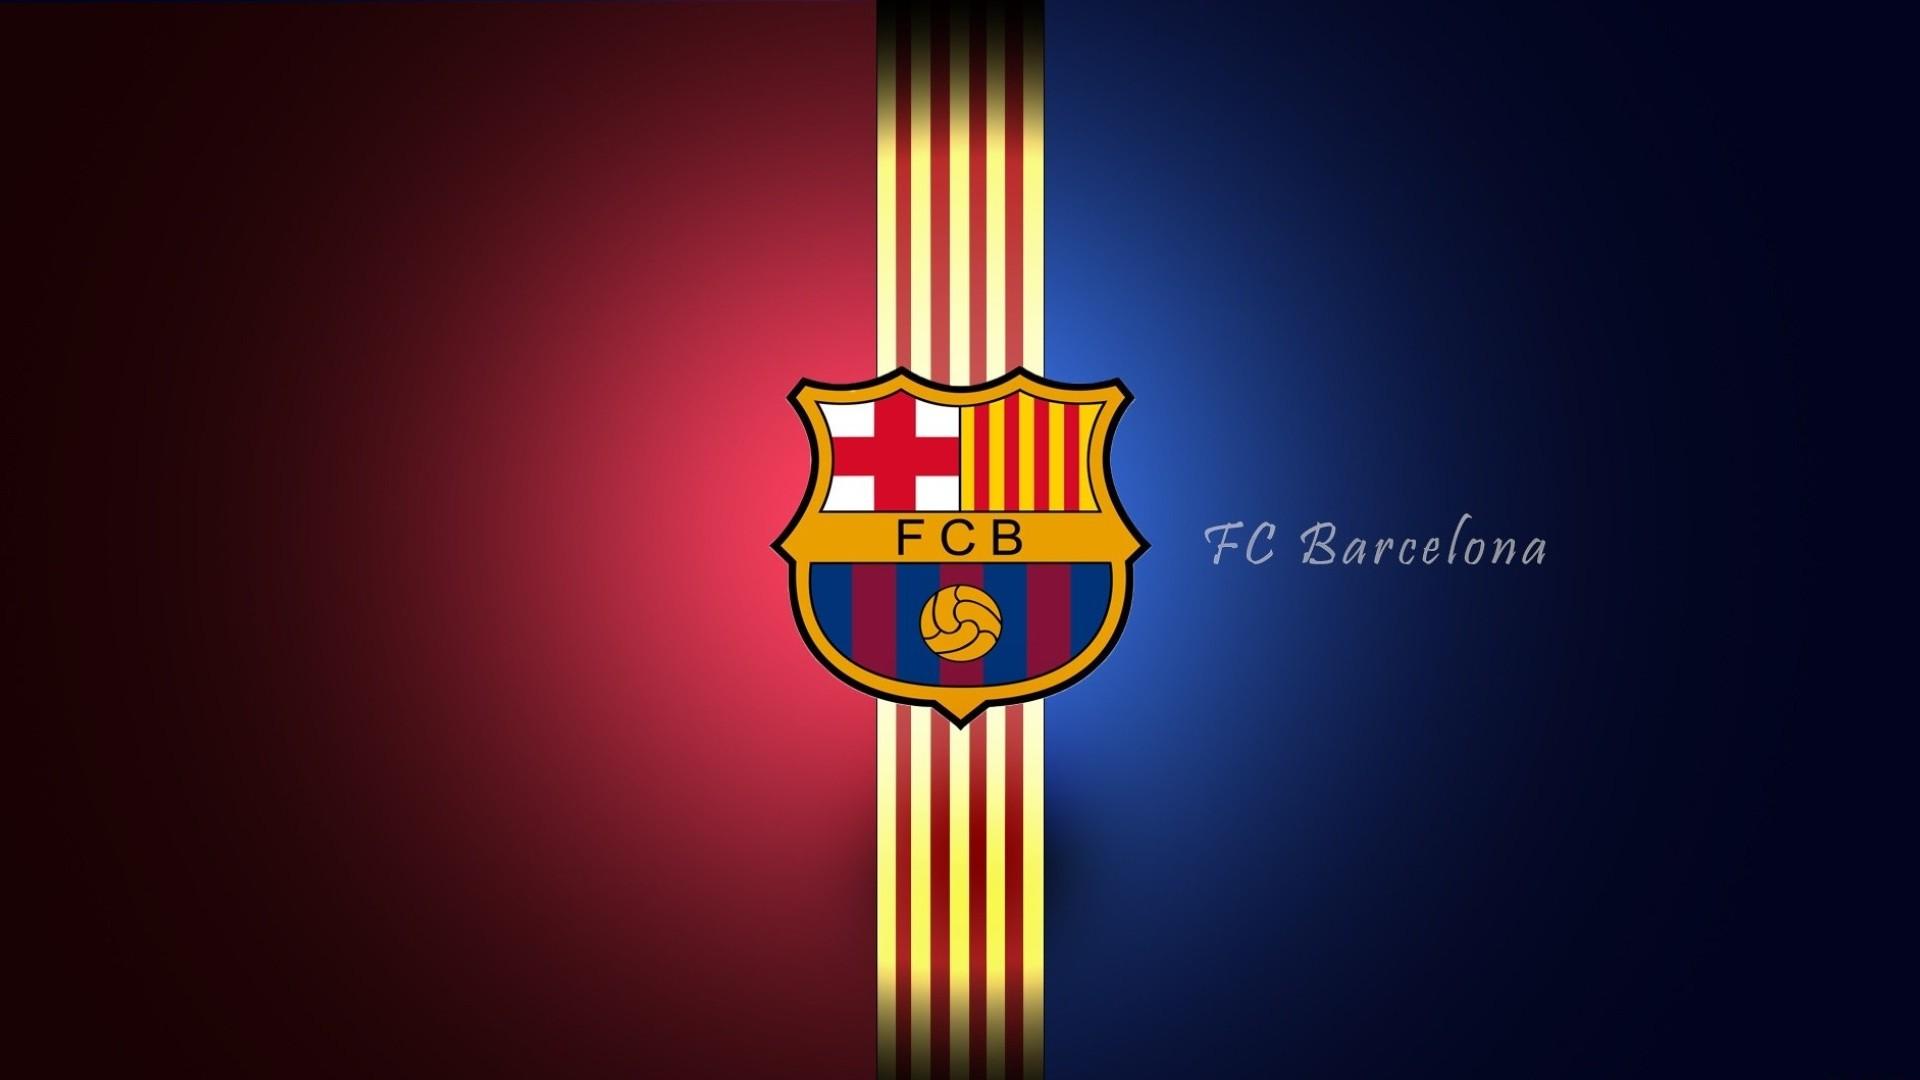 FC Barcelona Wallpapers HD Download 1920x1080